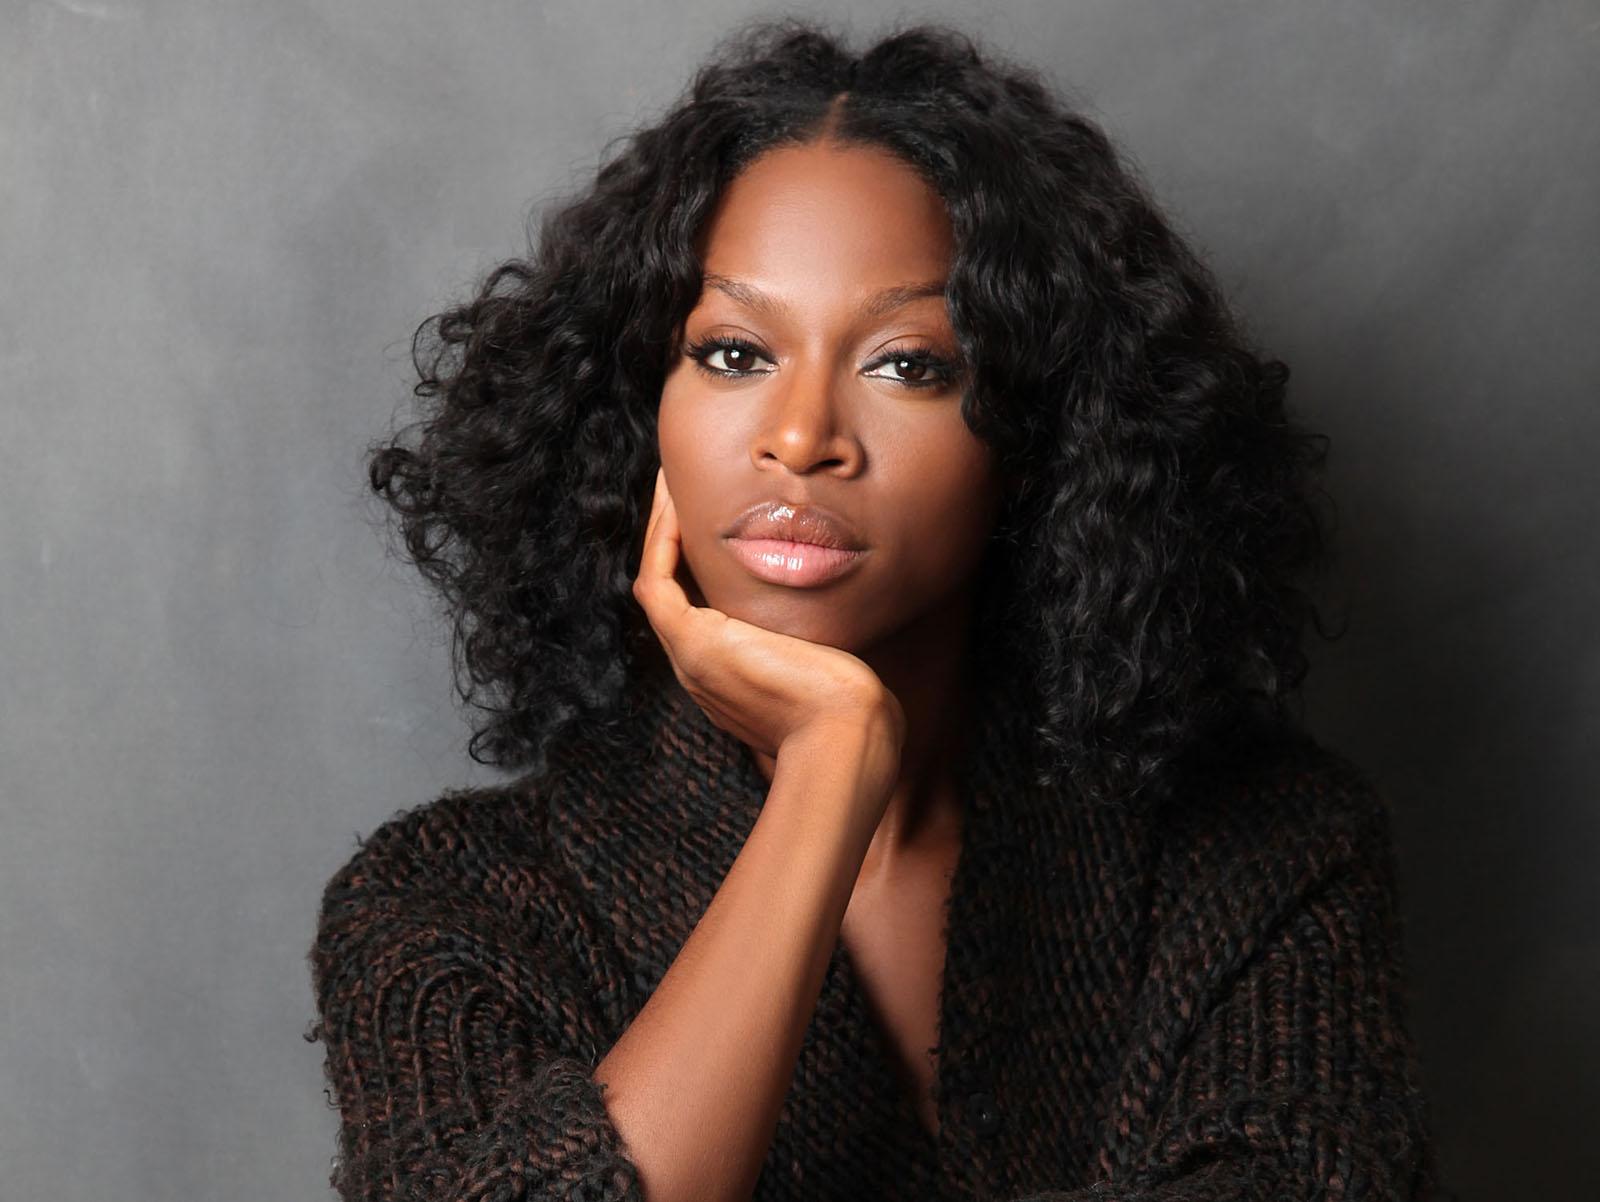 black beautiful women dating sites